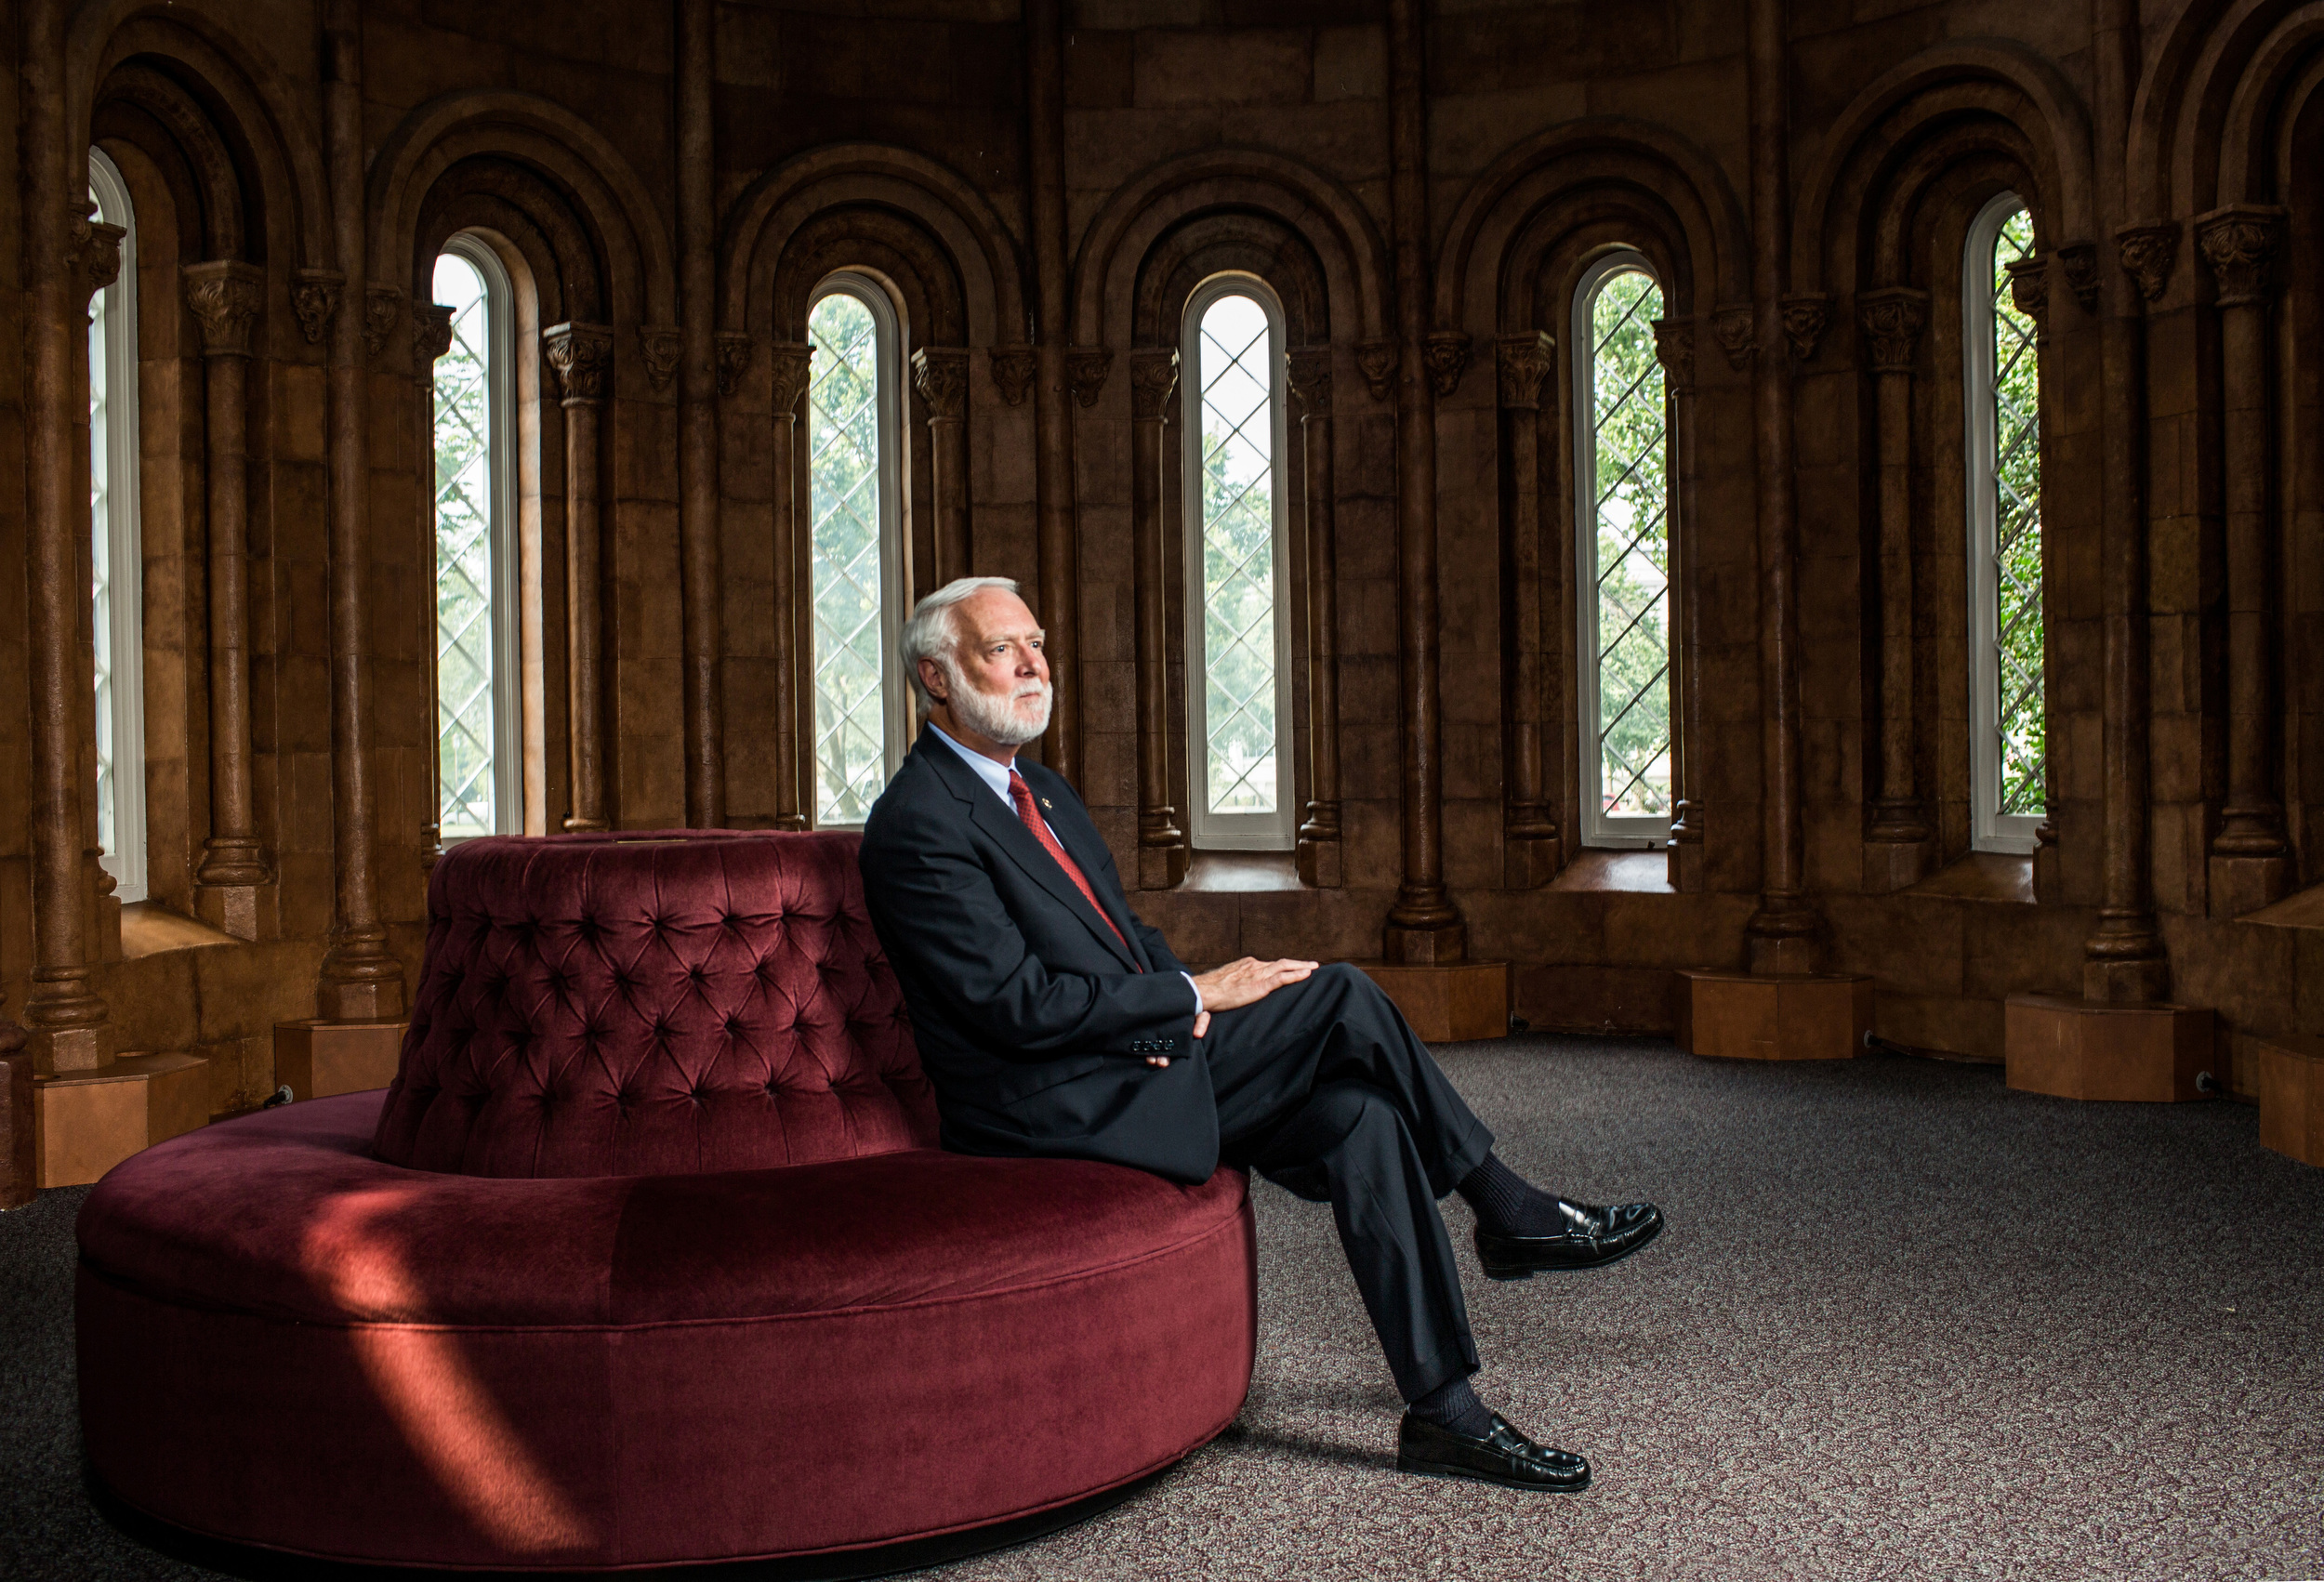 Secretary of the Smithsonian Institution Wayne Clough